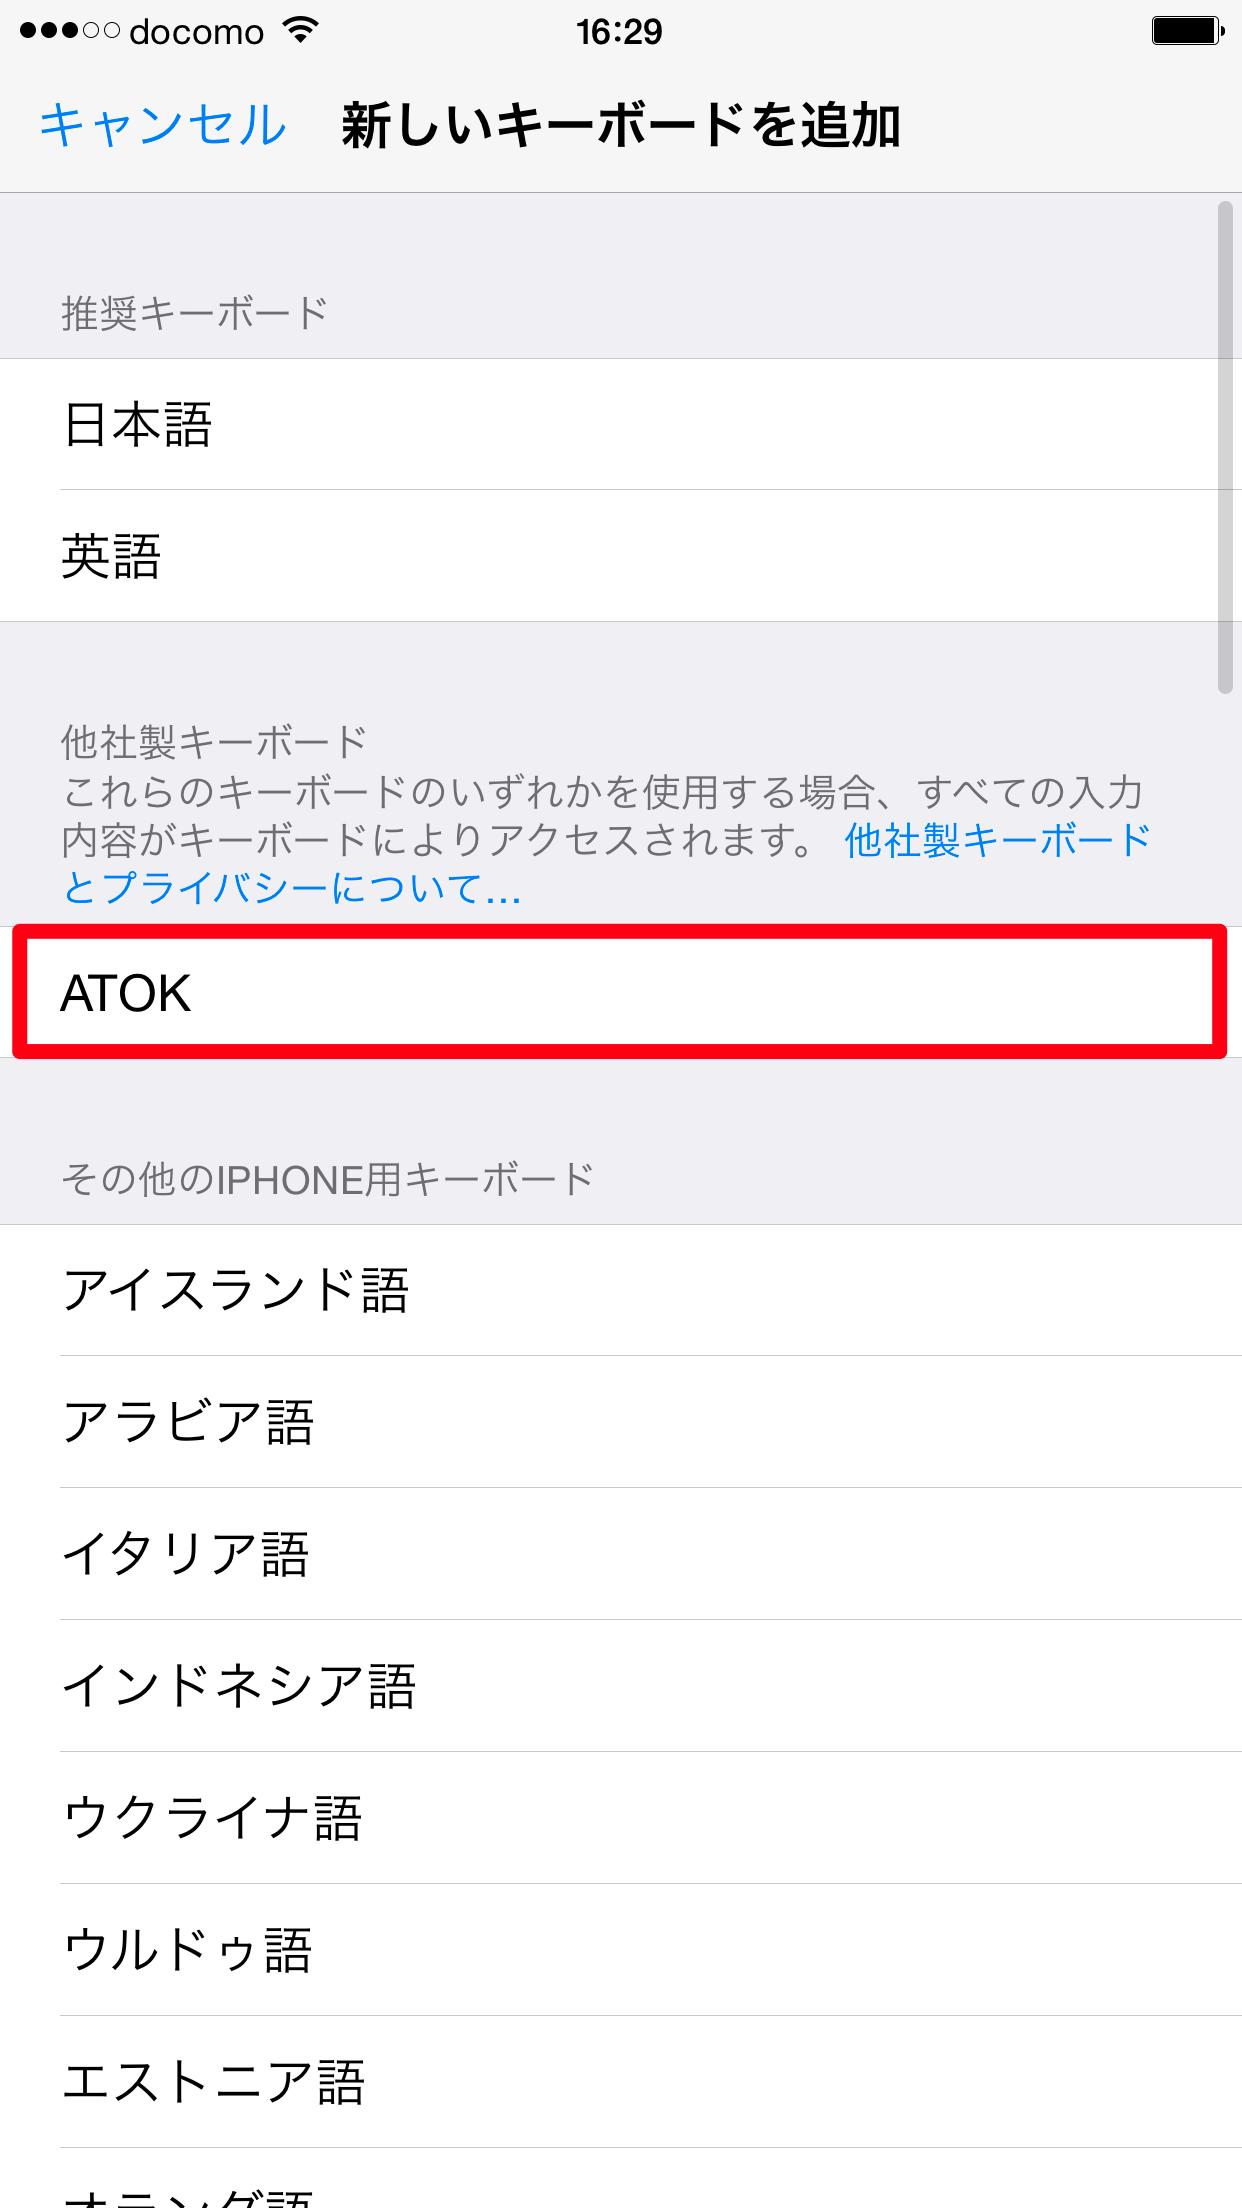 ATOKをキーボードとして追加する